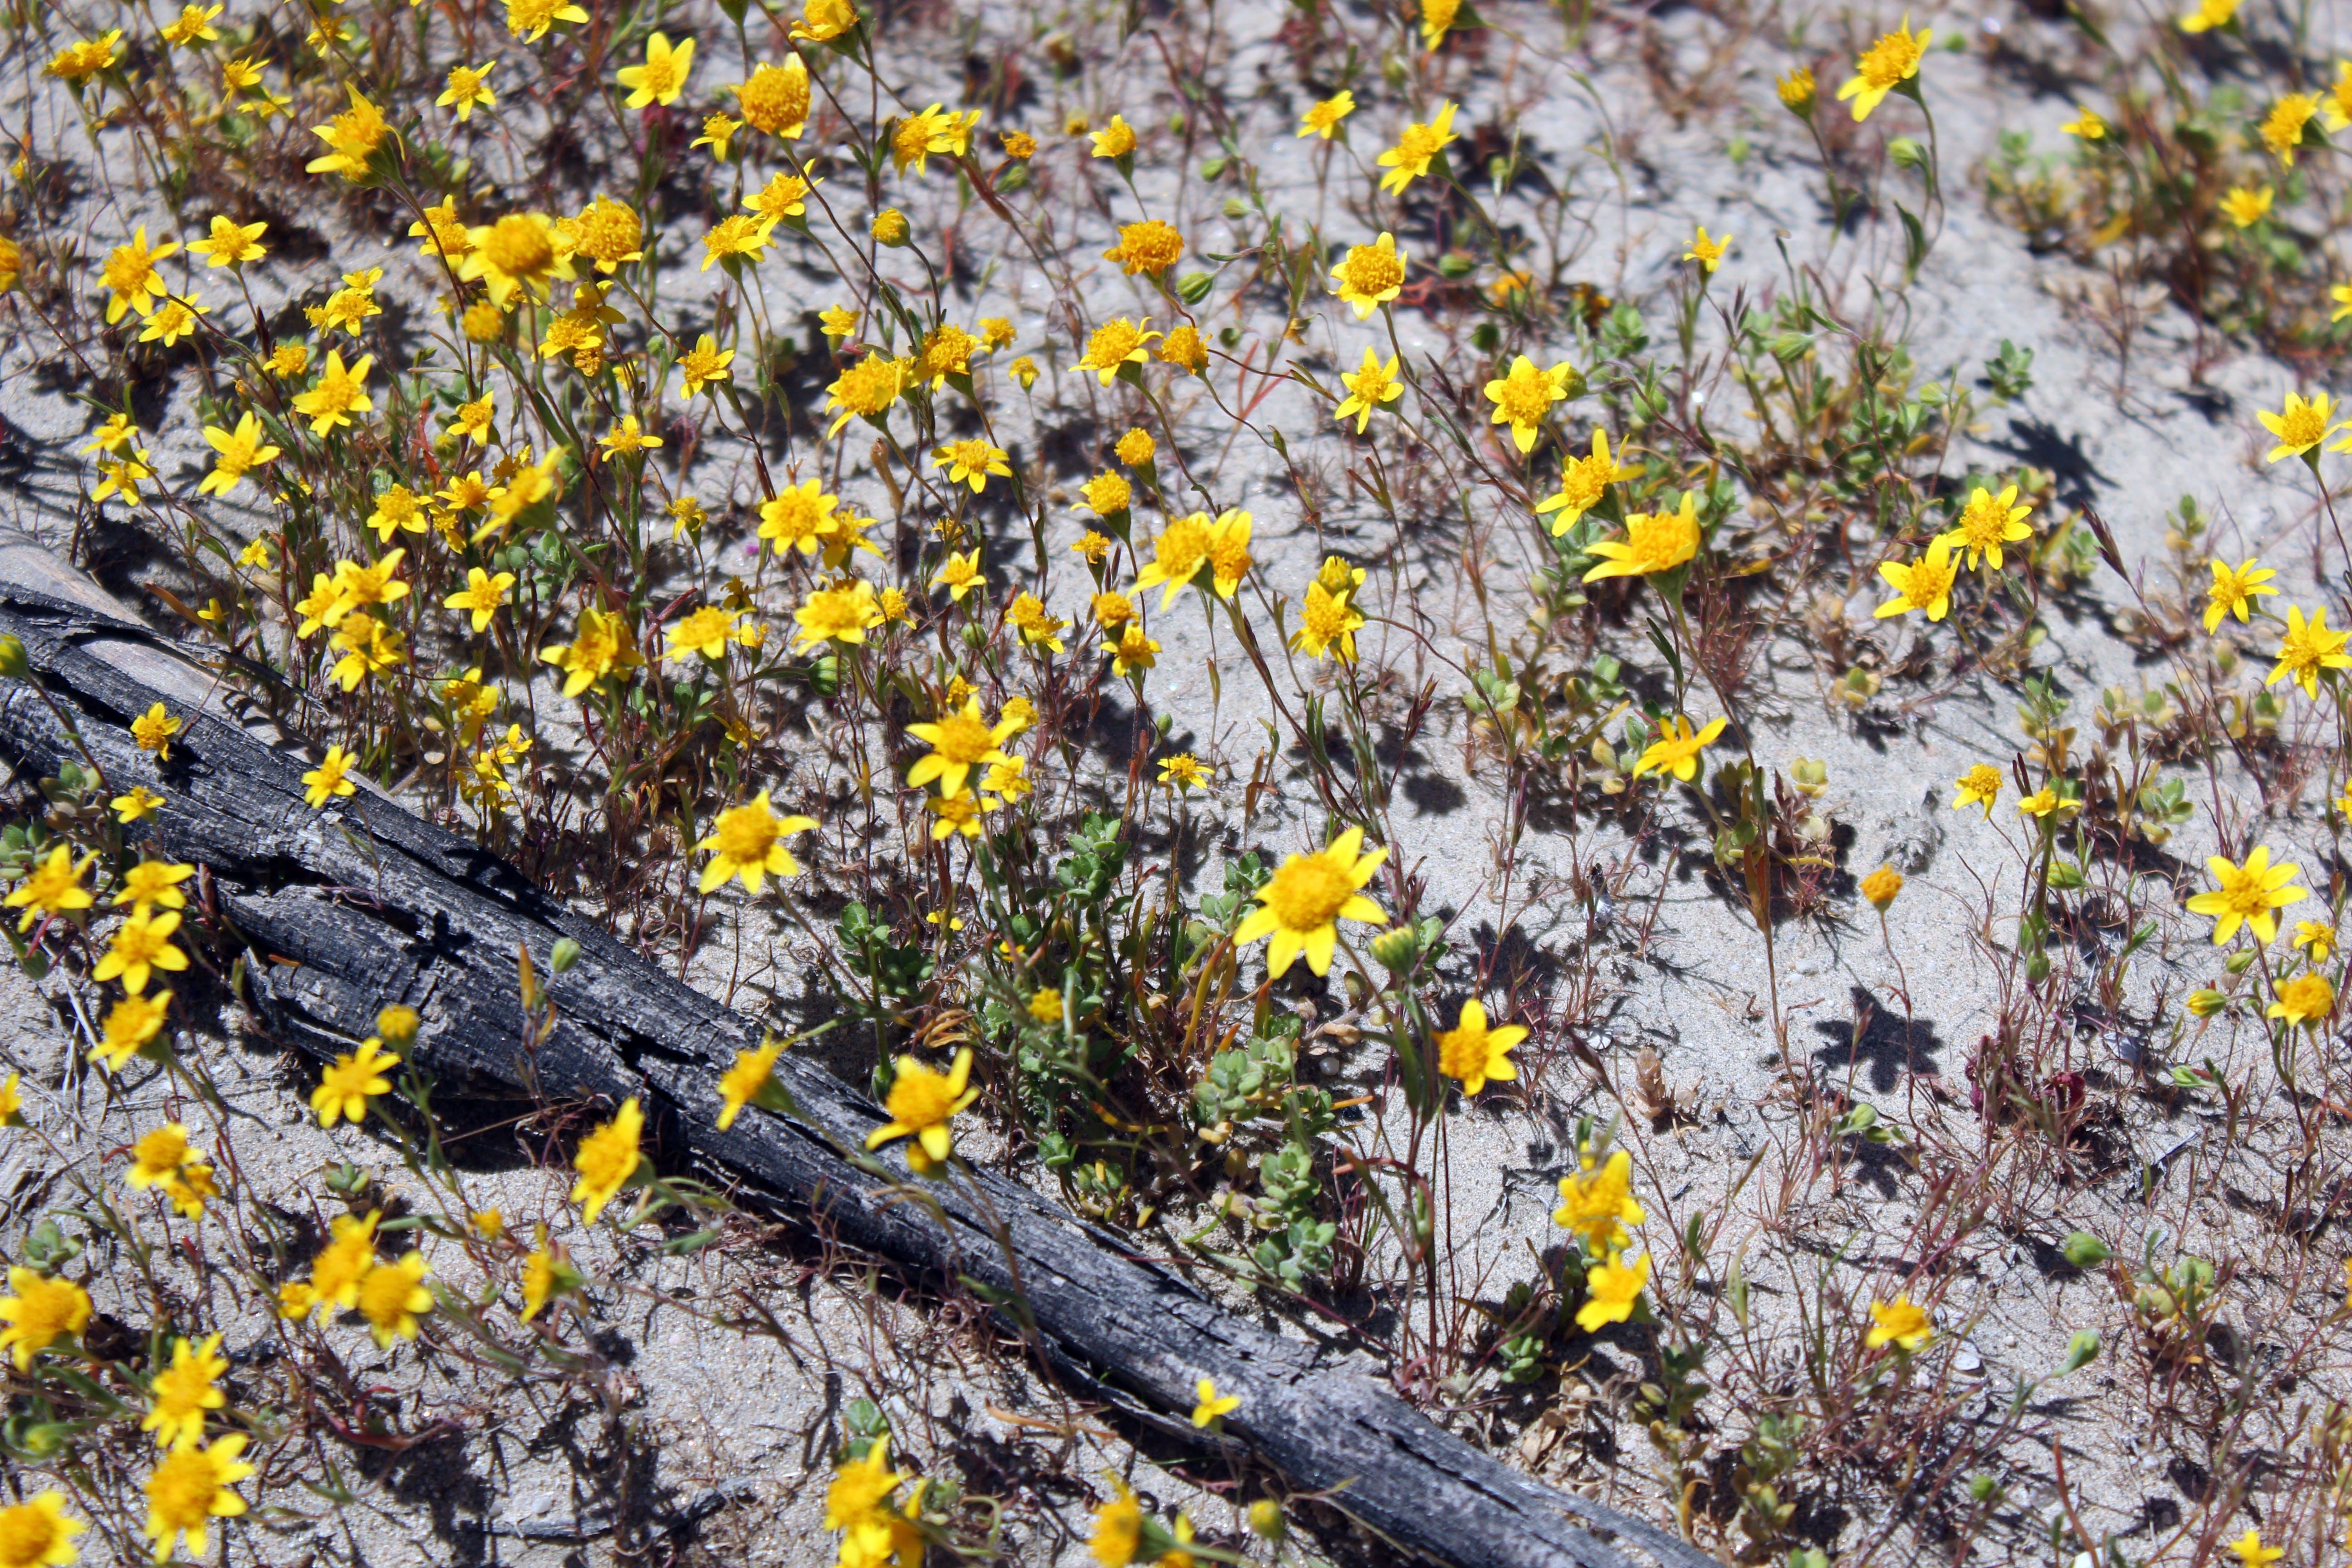 Free stock photo of yellow flowers